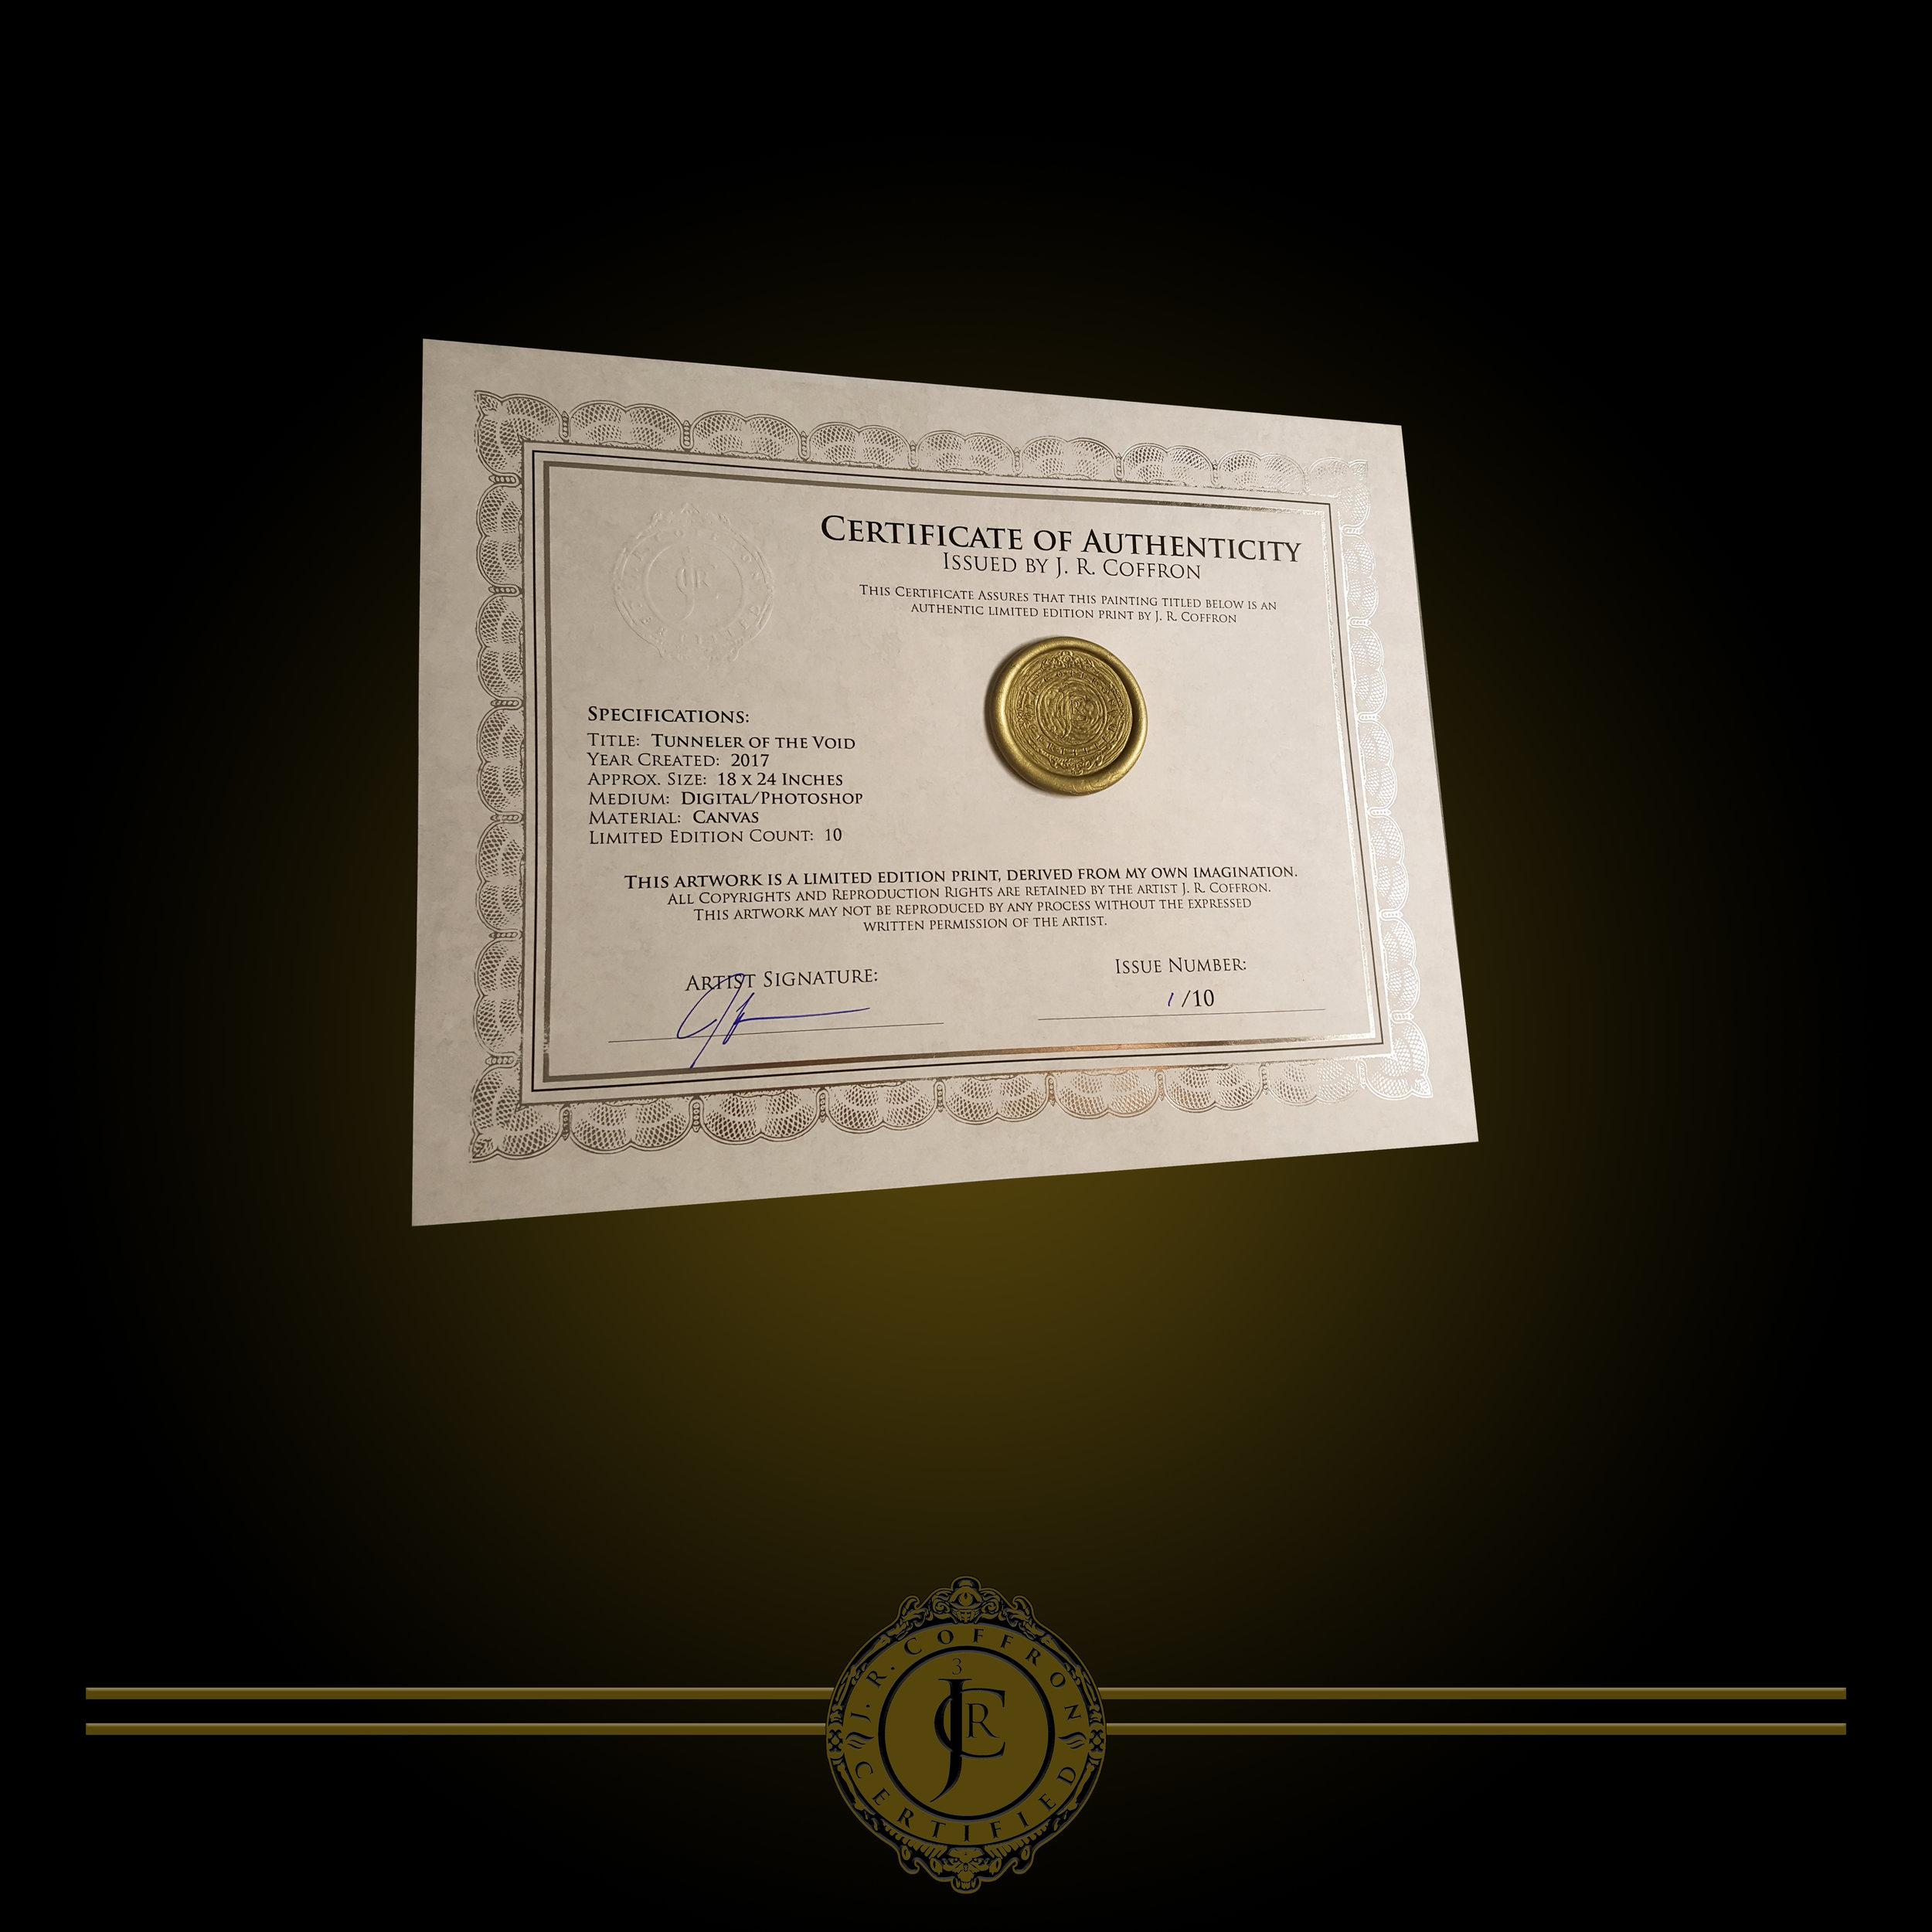 Tsillah_limitededion_certificate.jpg